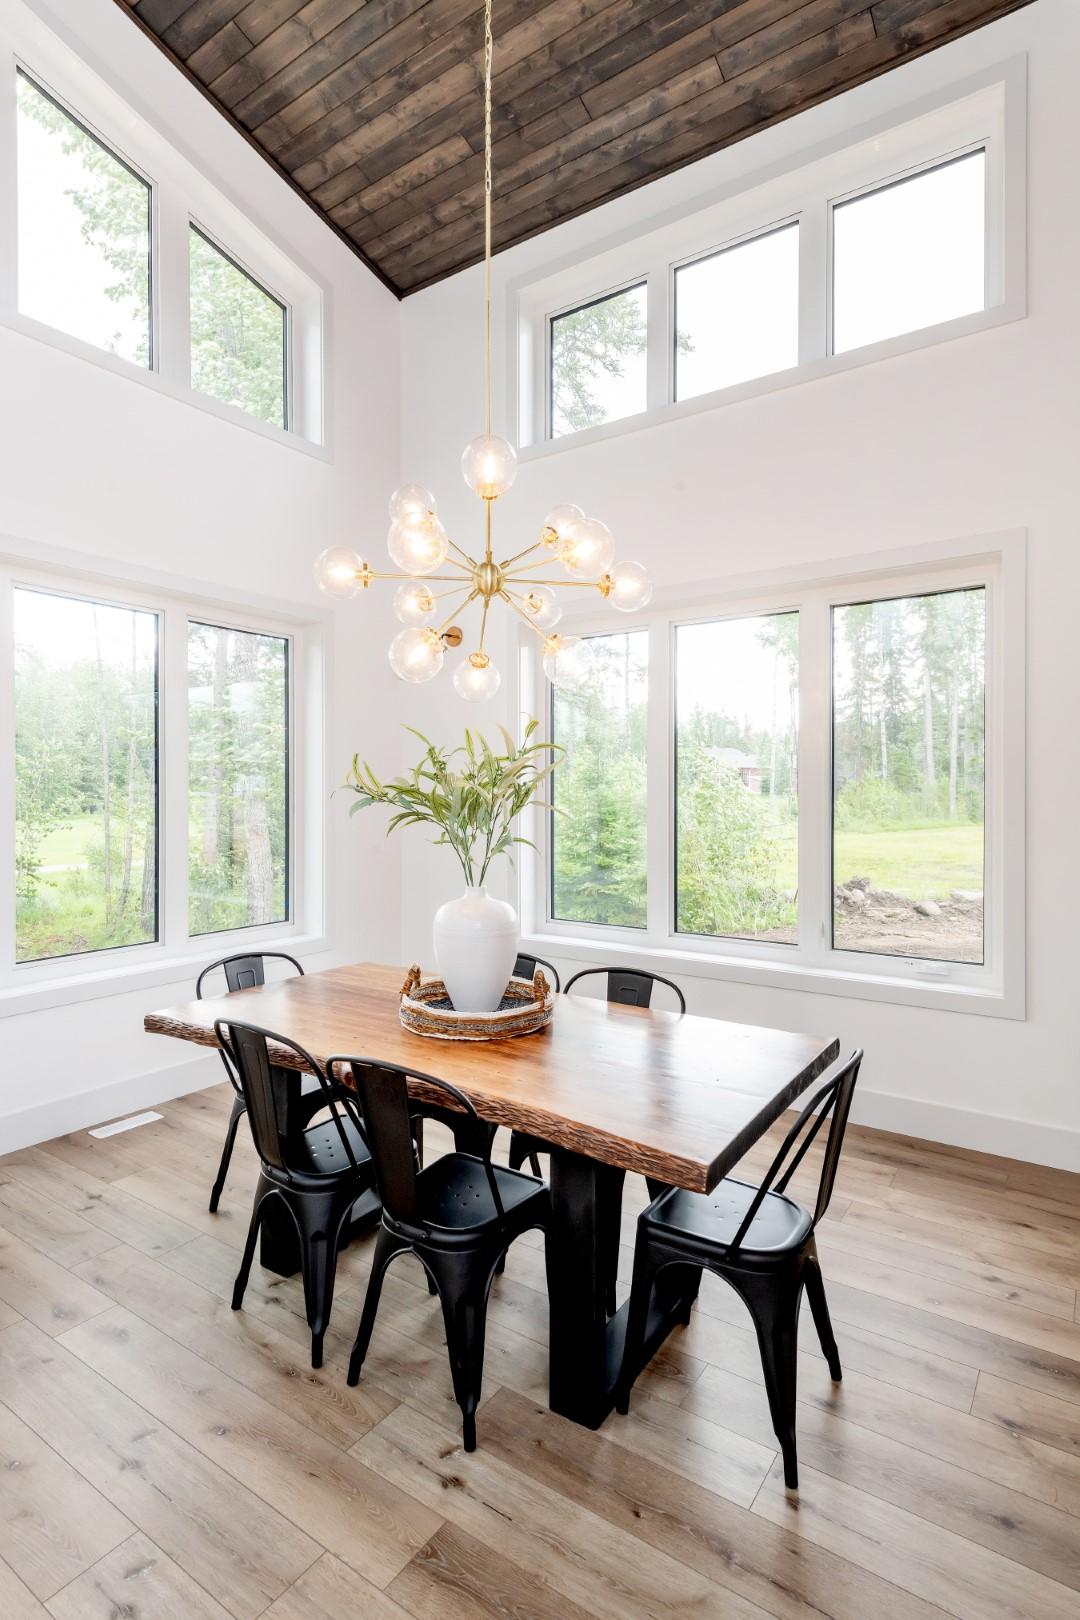 Saskatoon Hospital Home Lottery 2019 Dining Room